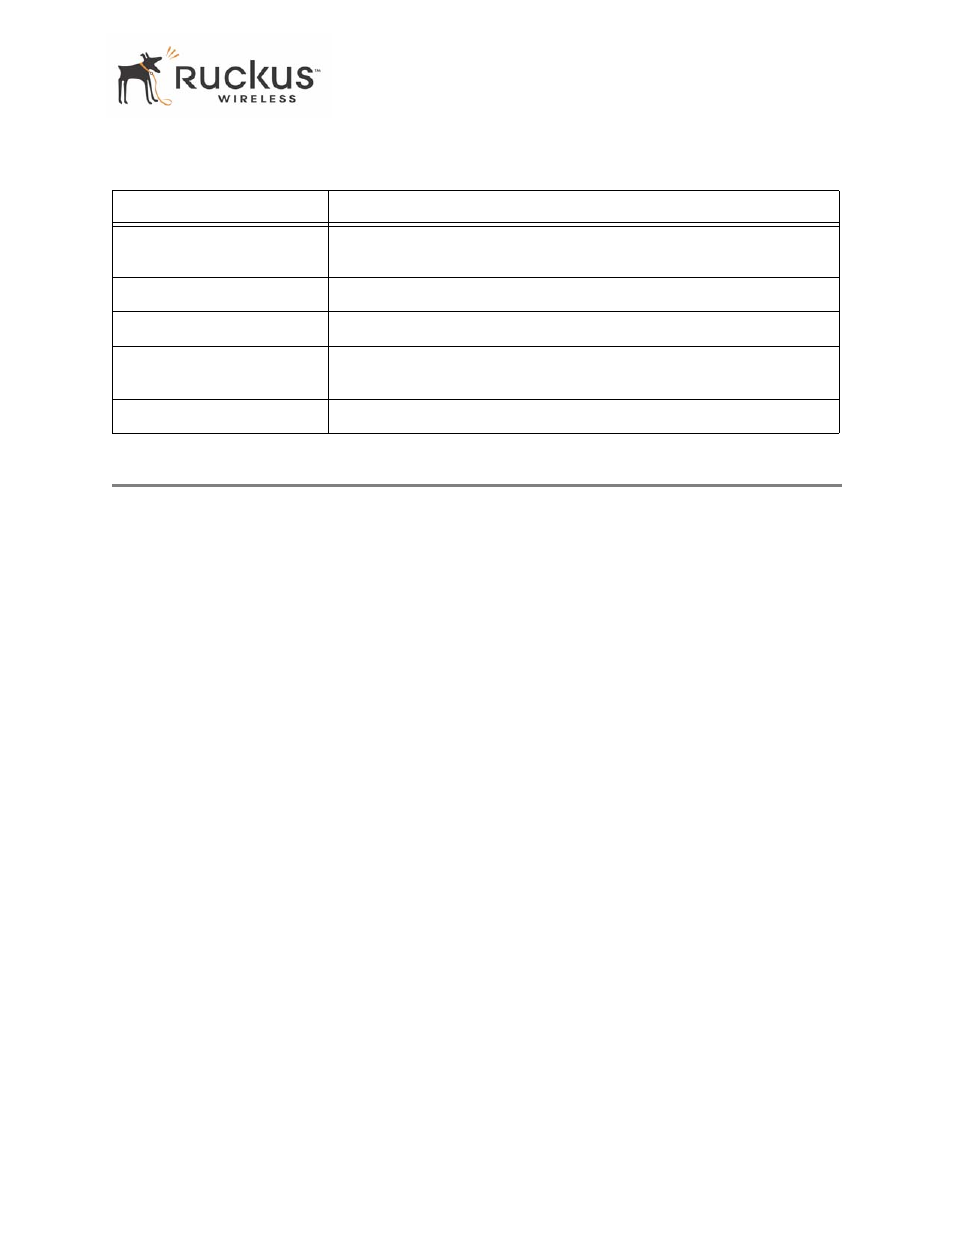 Ruckus mm2211 firmware upgrade